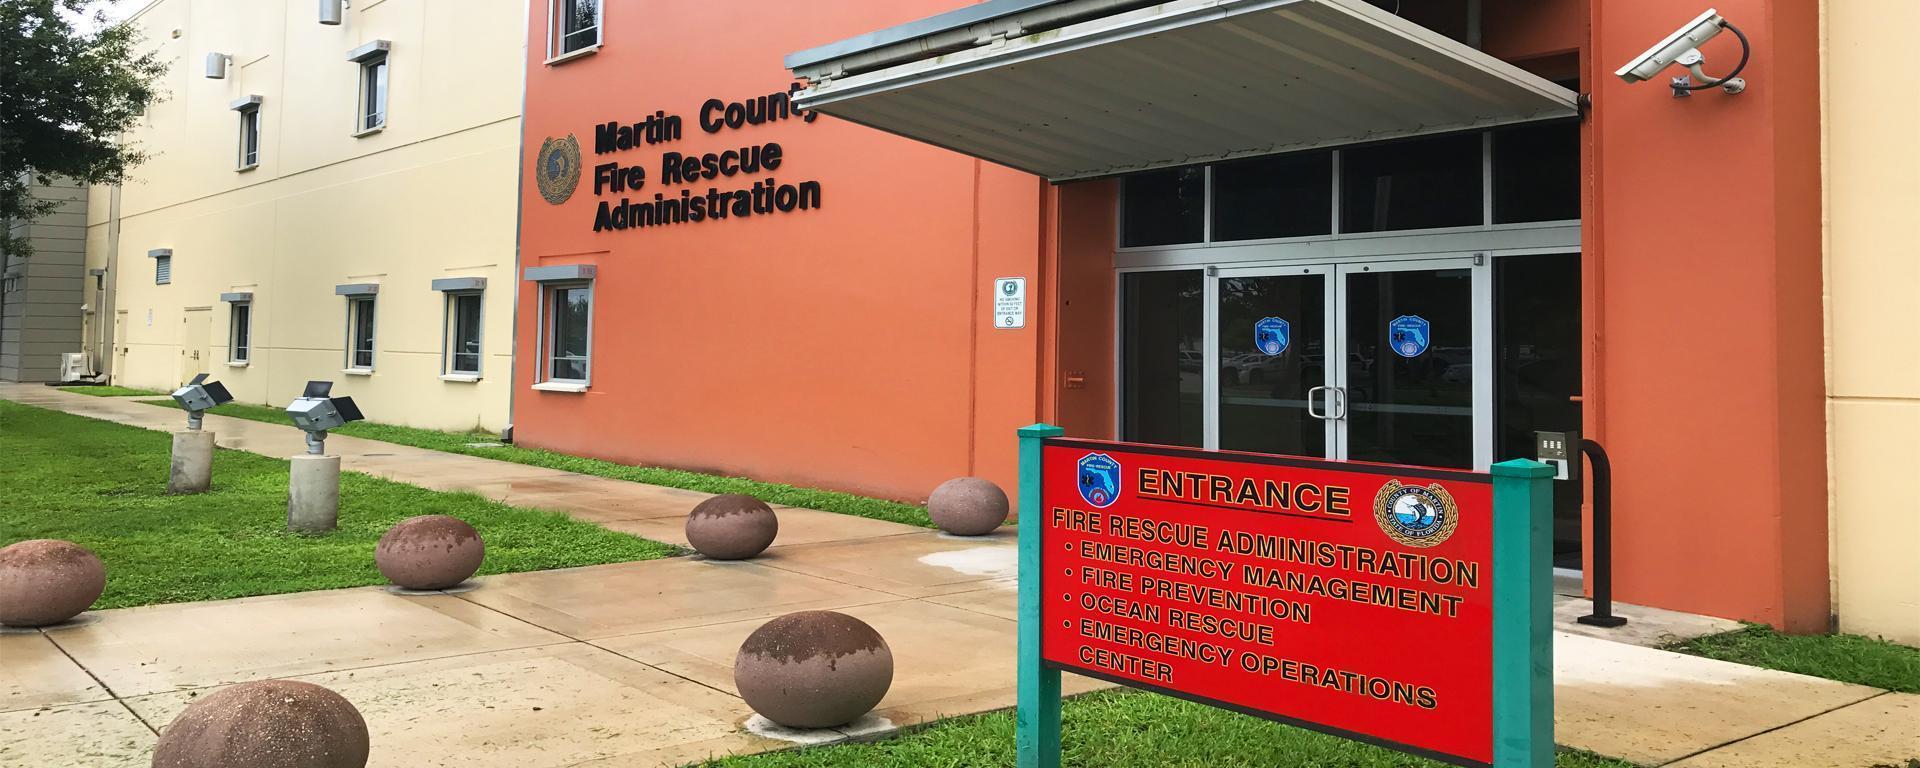 Martin County Emergency Management